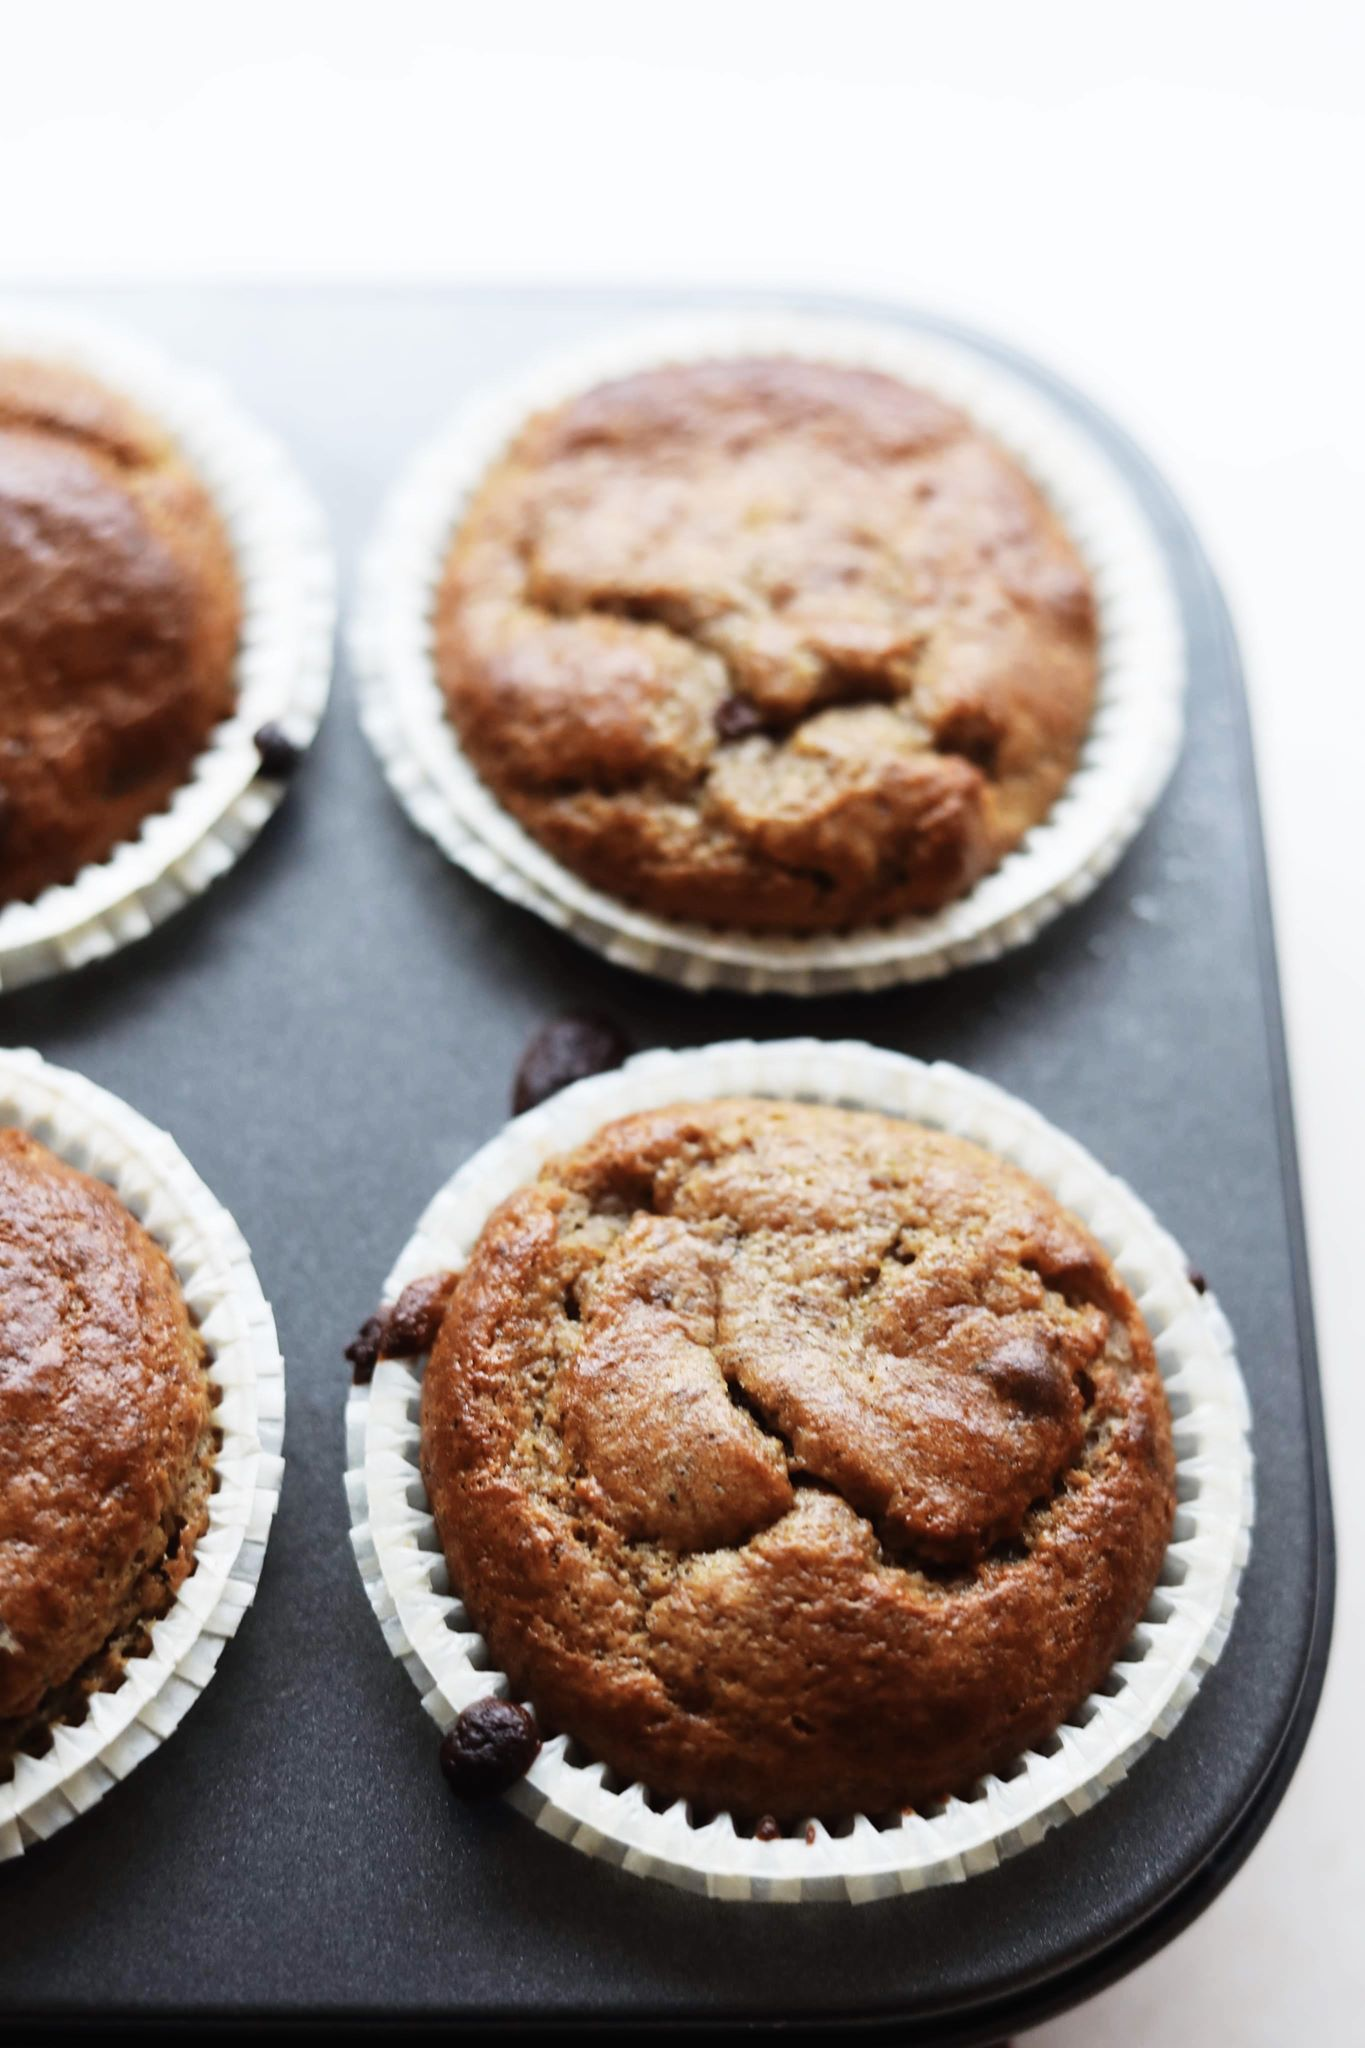 Fredagshygge- Sundere bananmuffins med chokolade